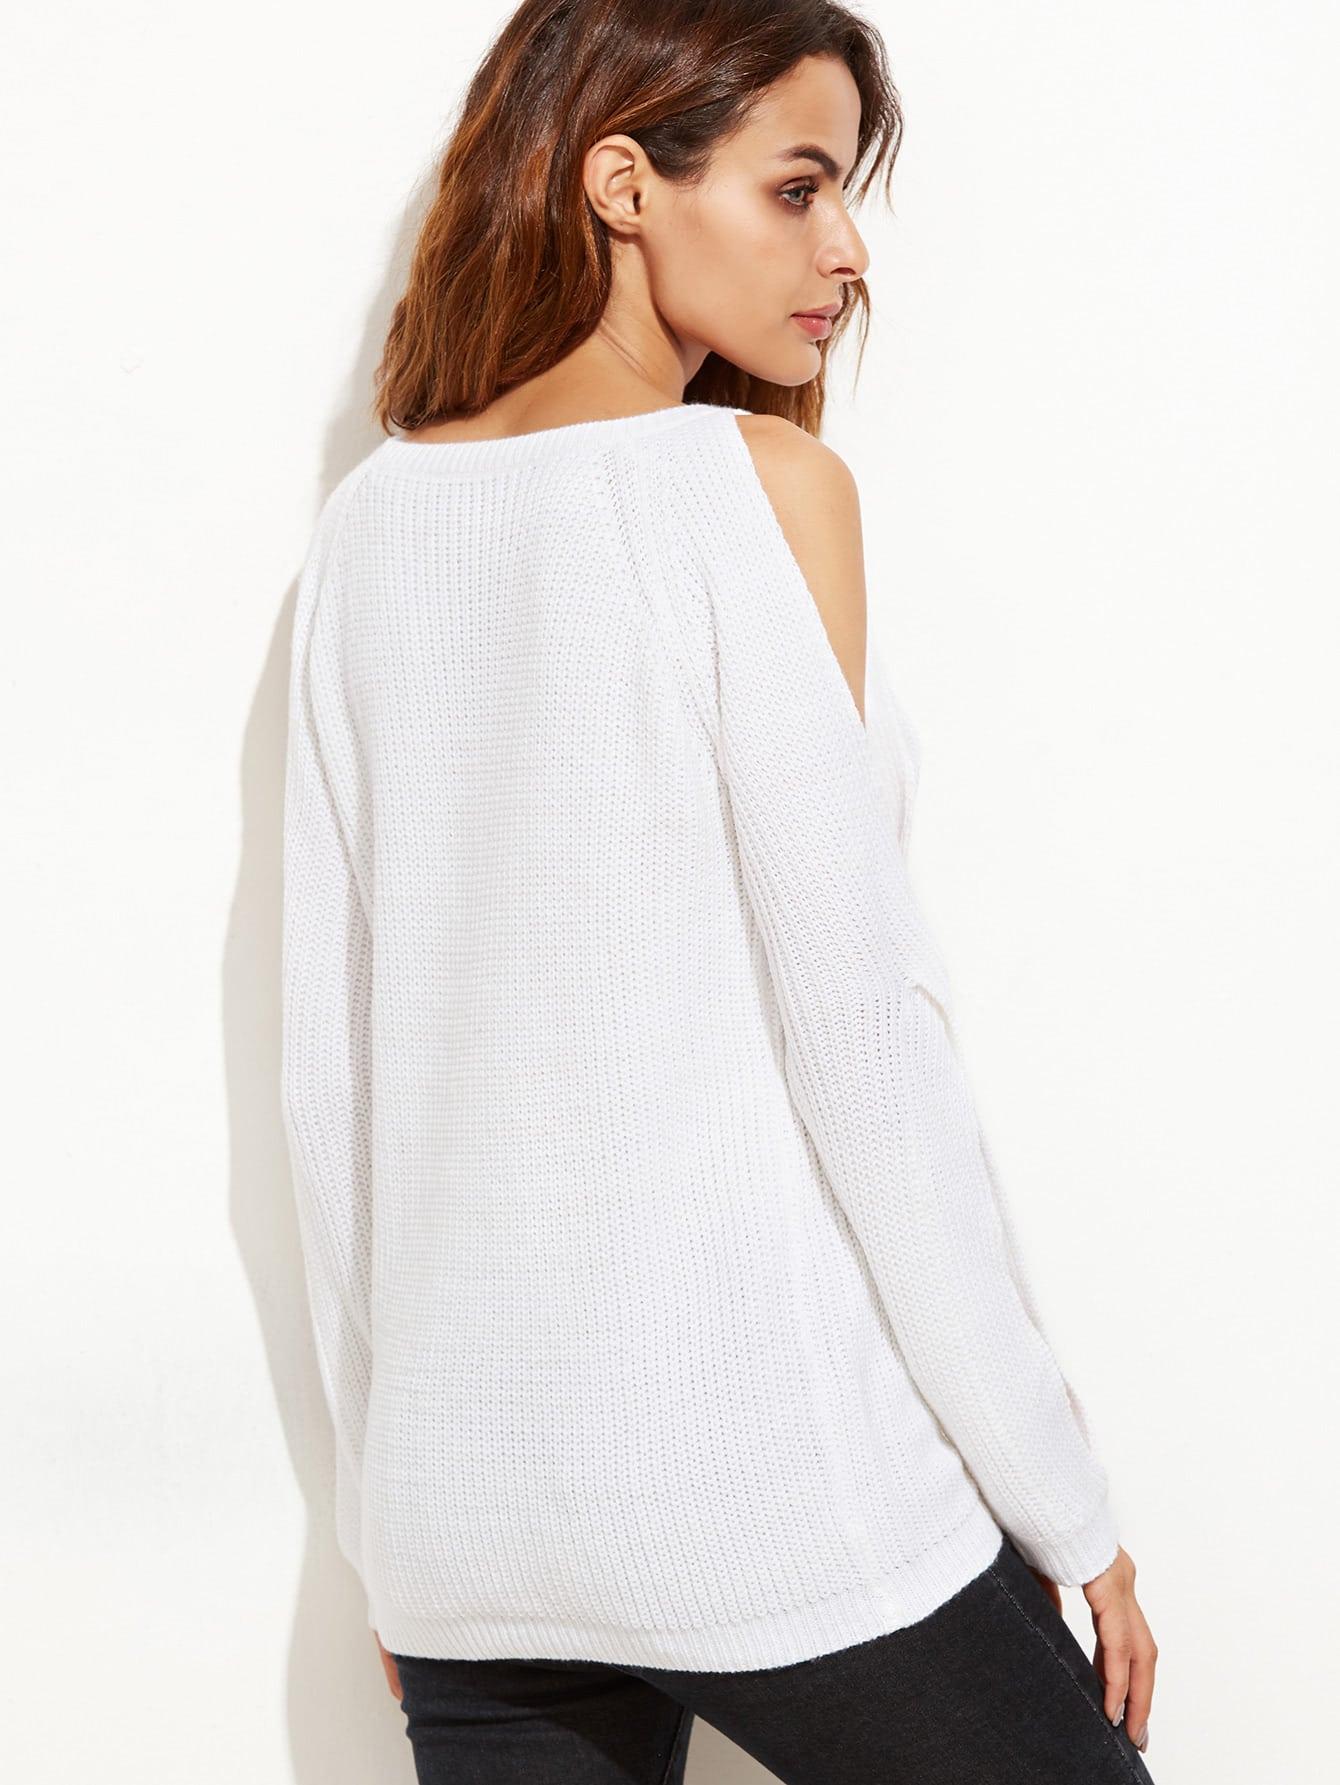 sweater160928452_2